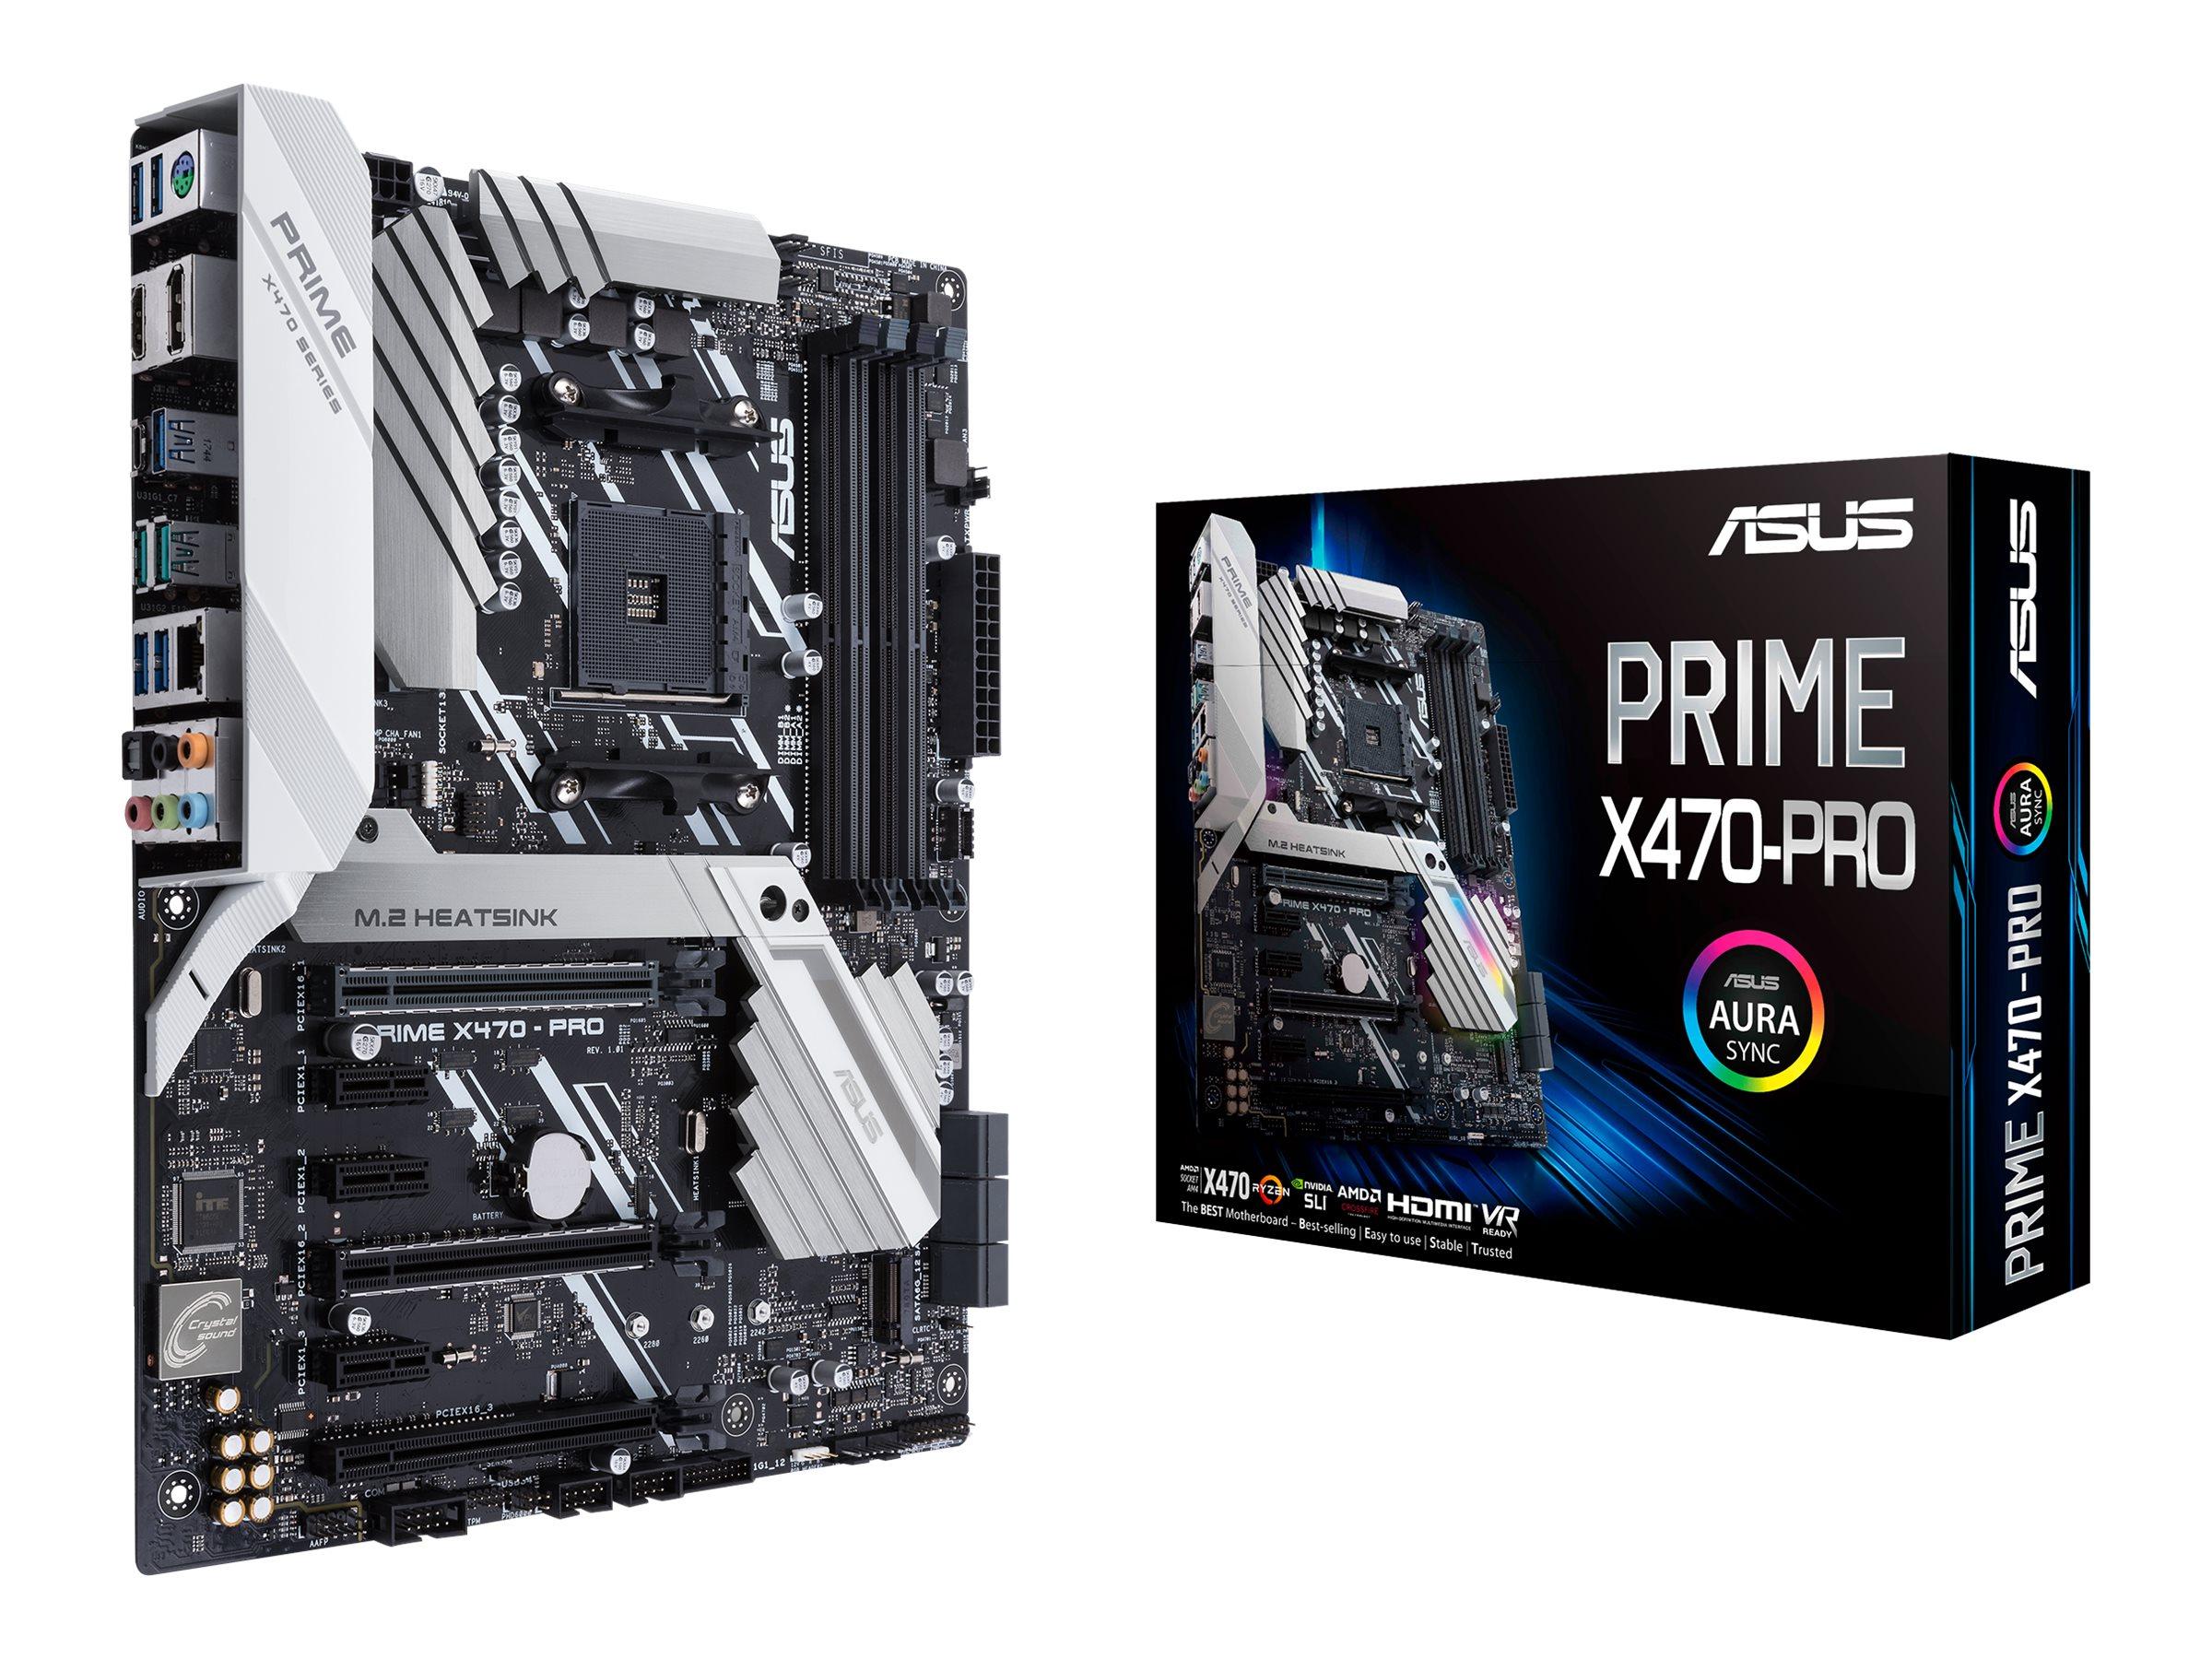 ASUS PRIME X470-PRO - Motherboard - ATX - Socket AM4 - AMD X470 - USB 3.1 Gen 1, USB 3.1 Gen 2, USB-C Gen1